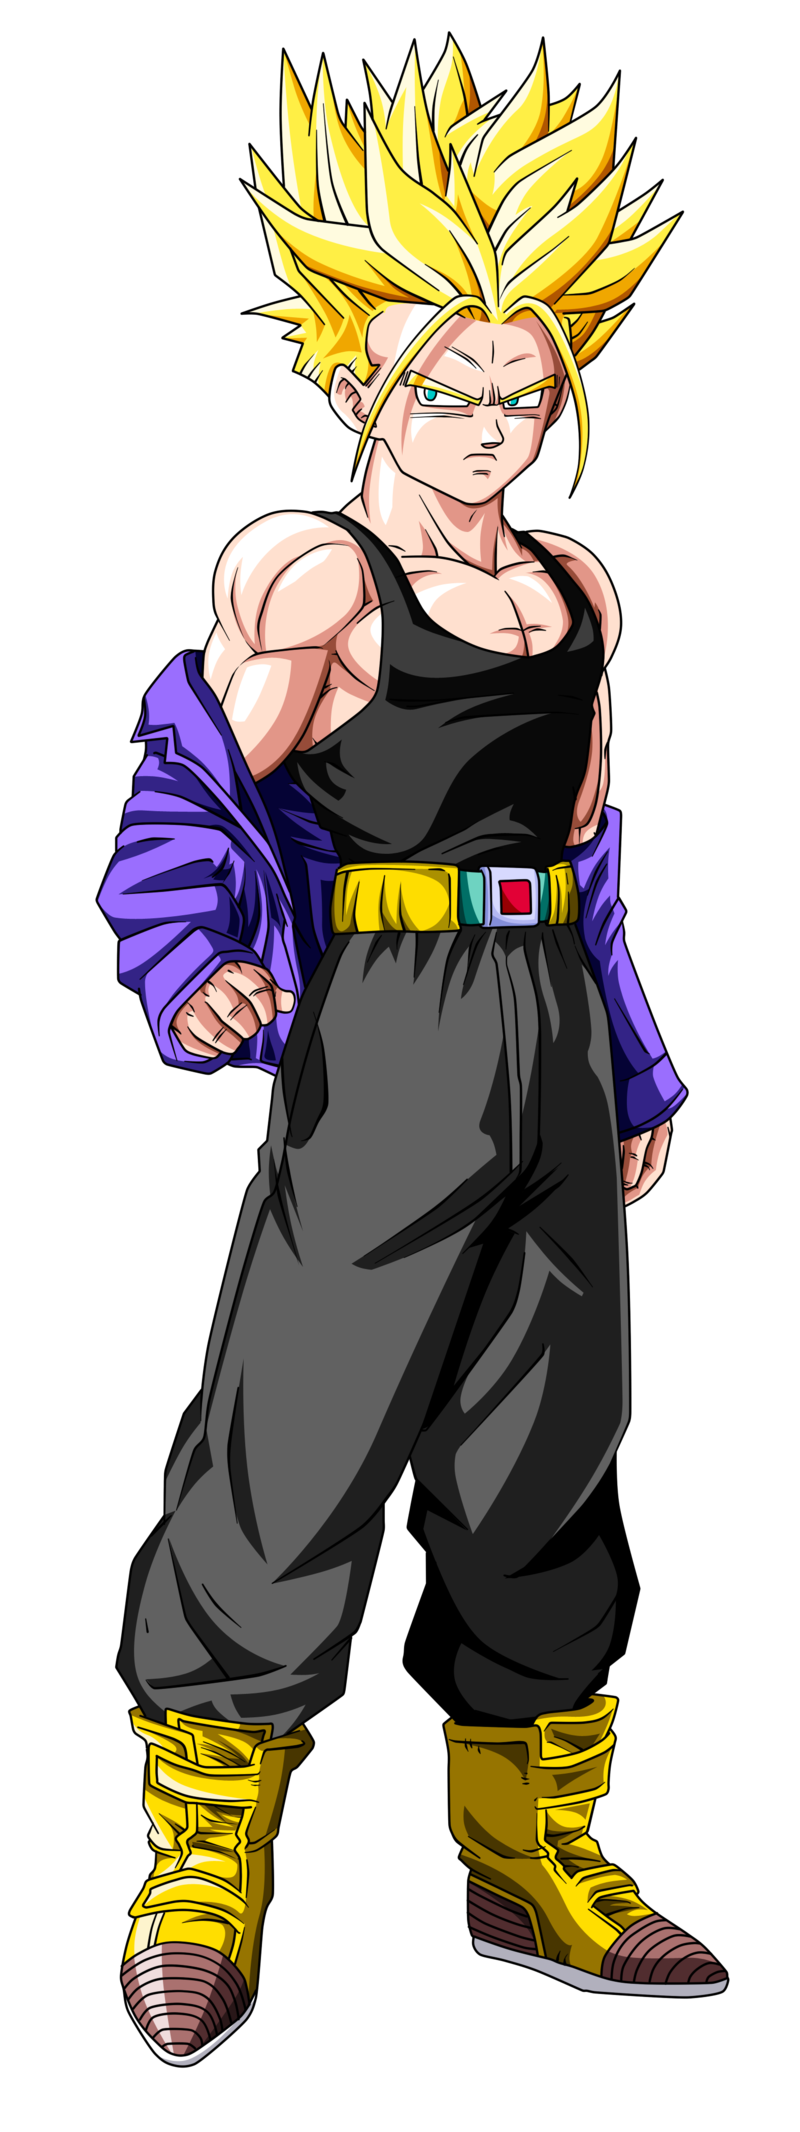 Imagen - Render de Trunks del Futuro.png - Dragon Ball Wiki